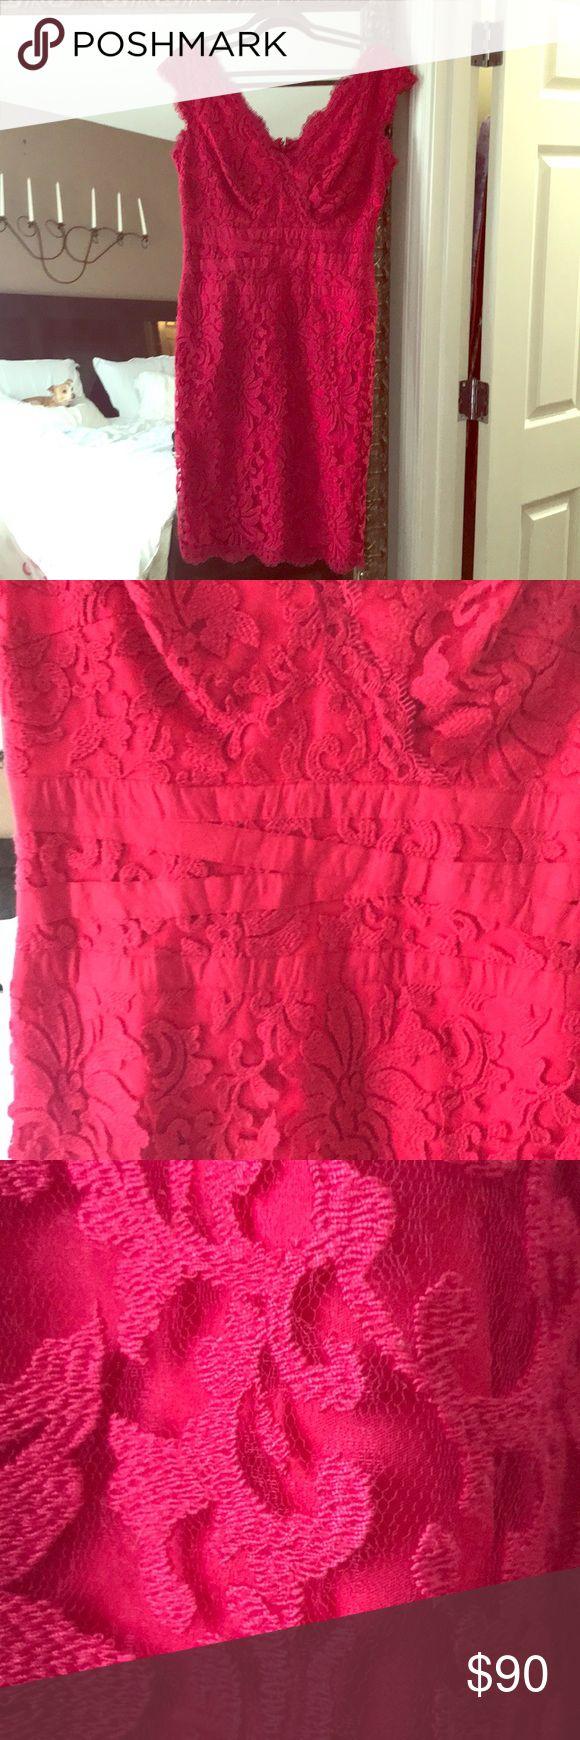 TADASHI SHOJI DRESS Cherry red lace. Size 12. Knee length. Tadashi Shoji Dresses